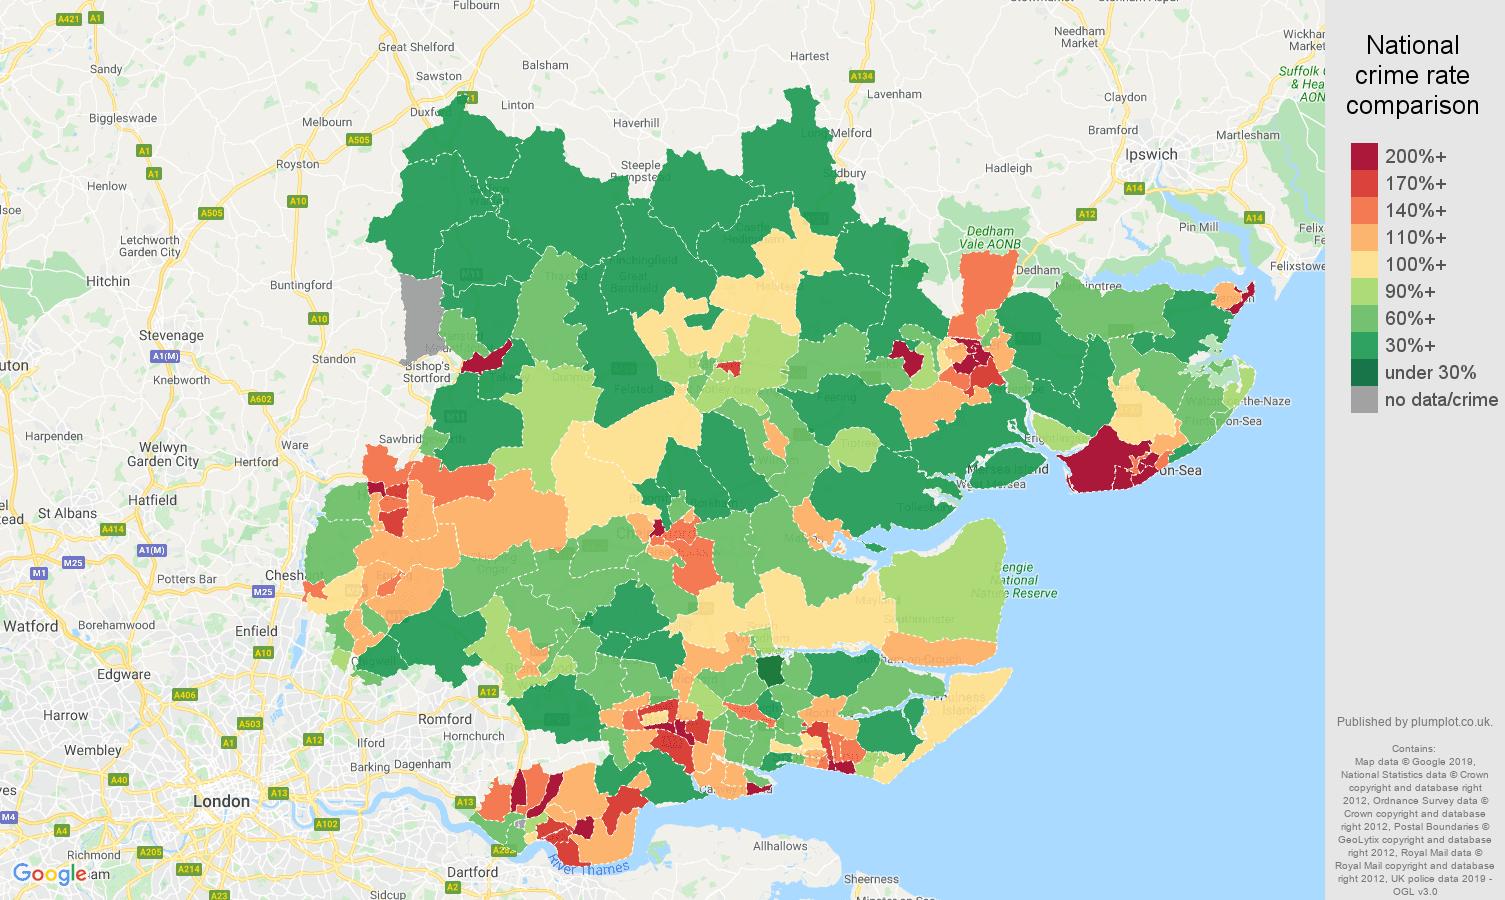 Essex public order crime rate comparison map